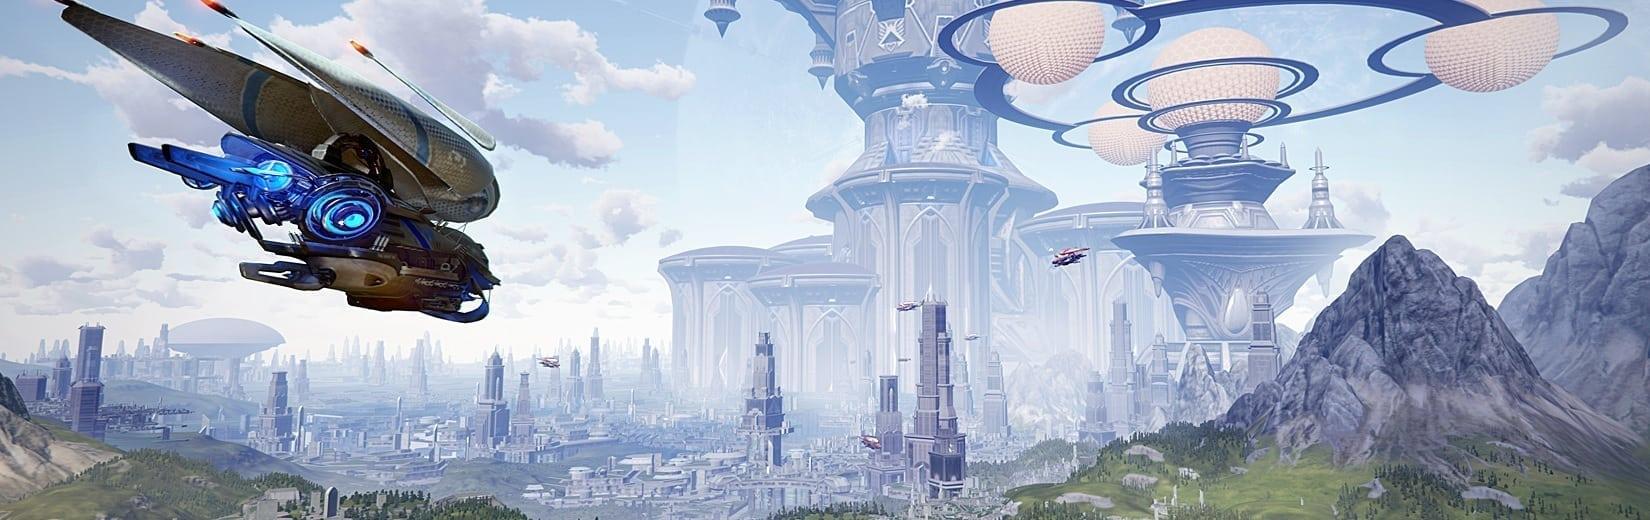 Skyforge image